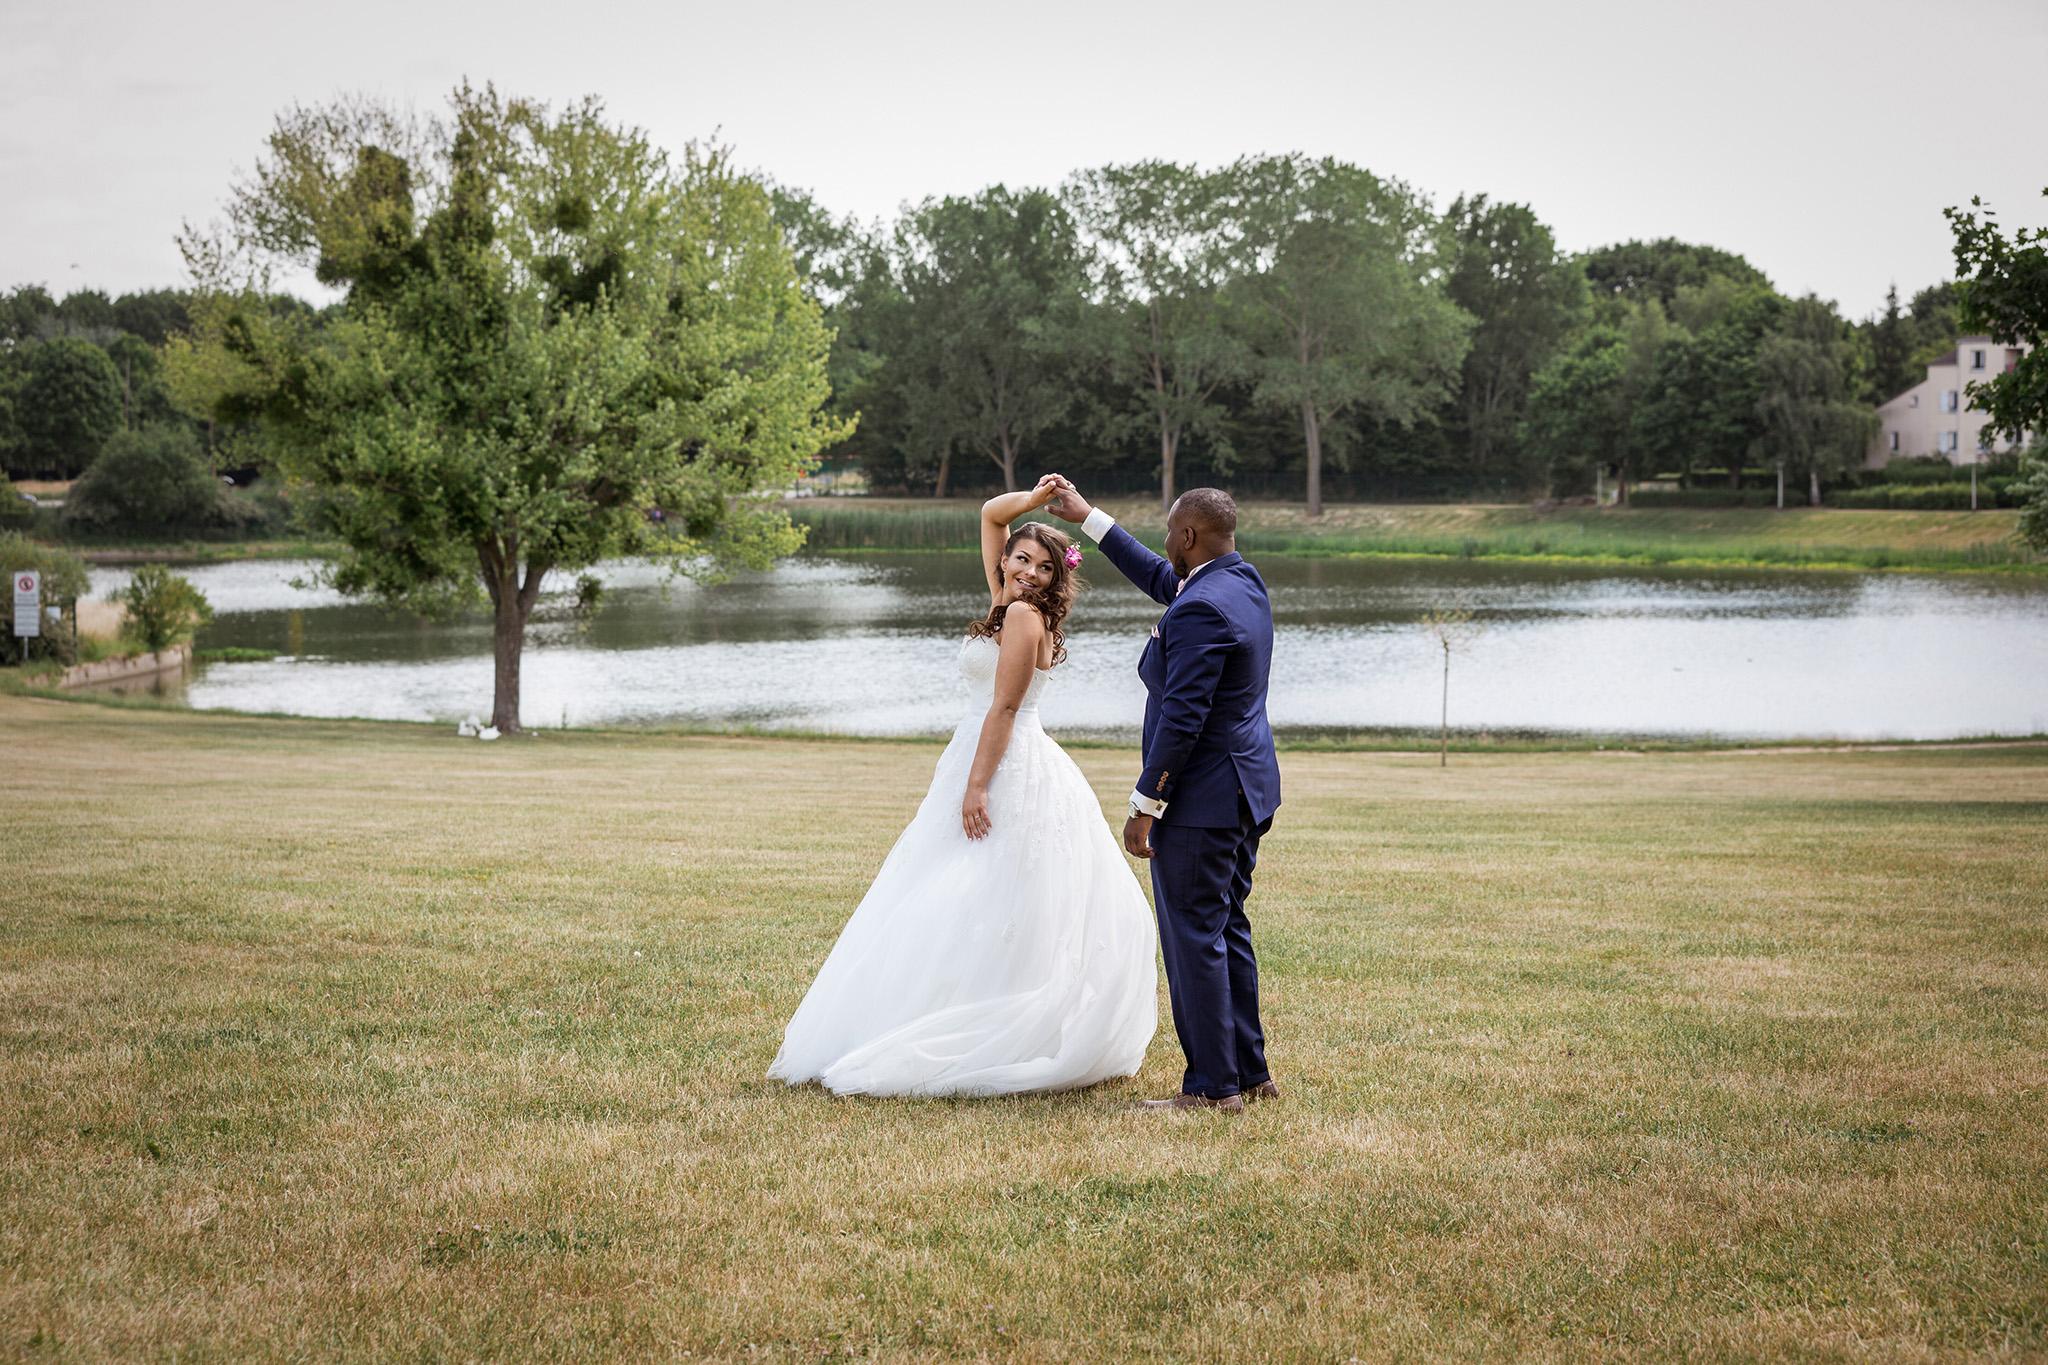 Le mariage de ANAIS & NITJI